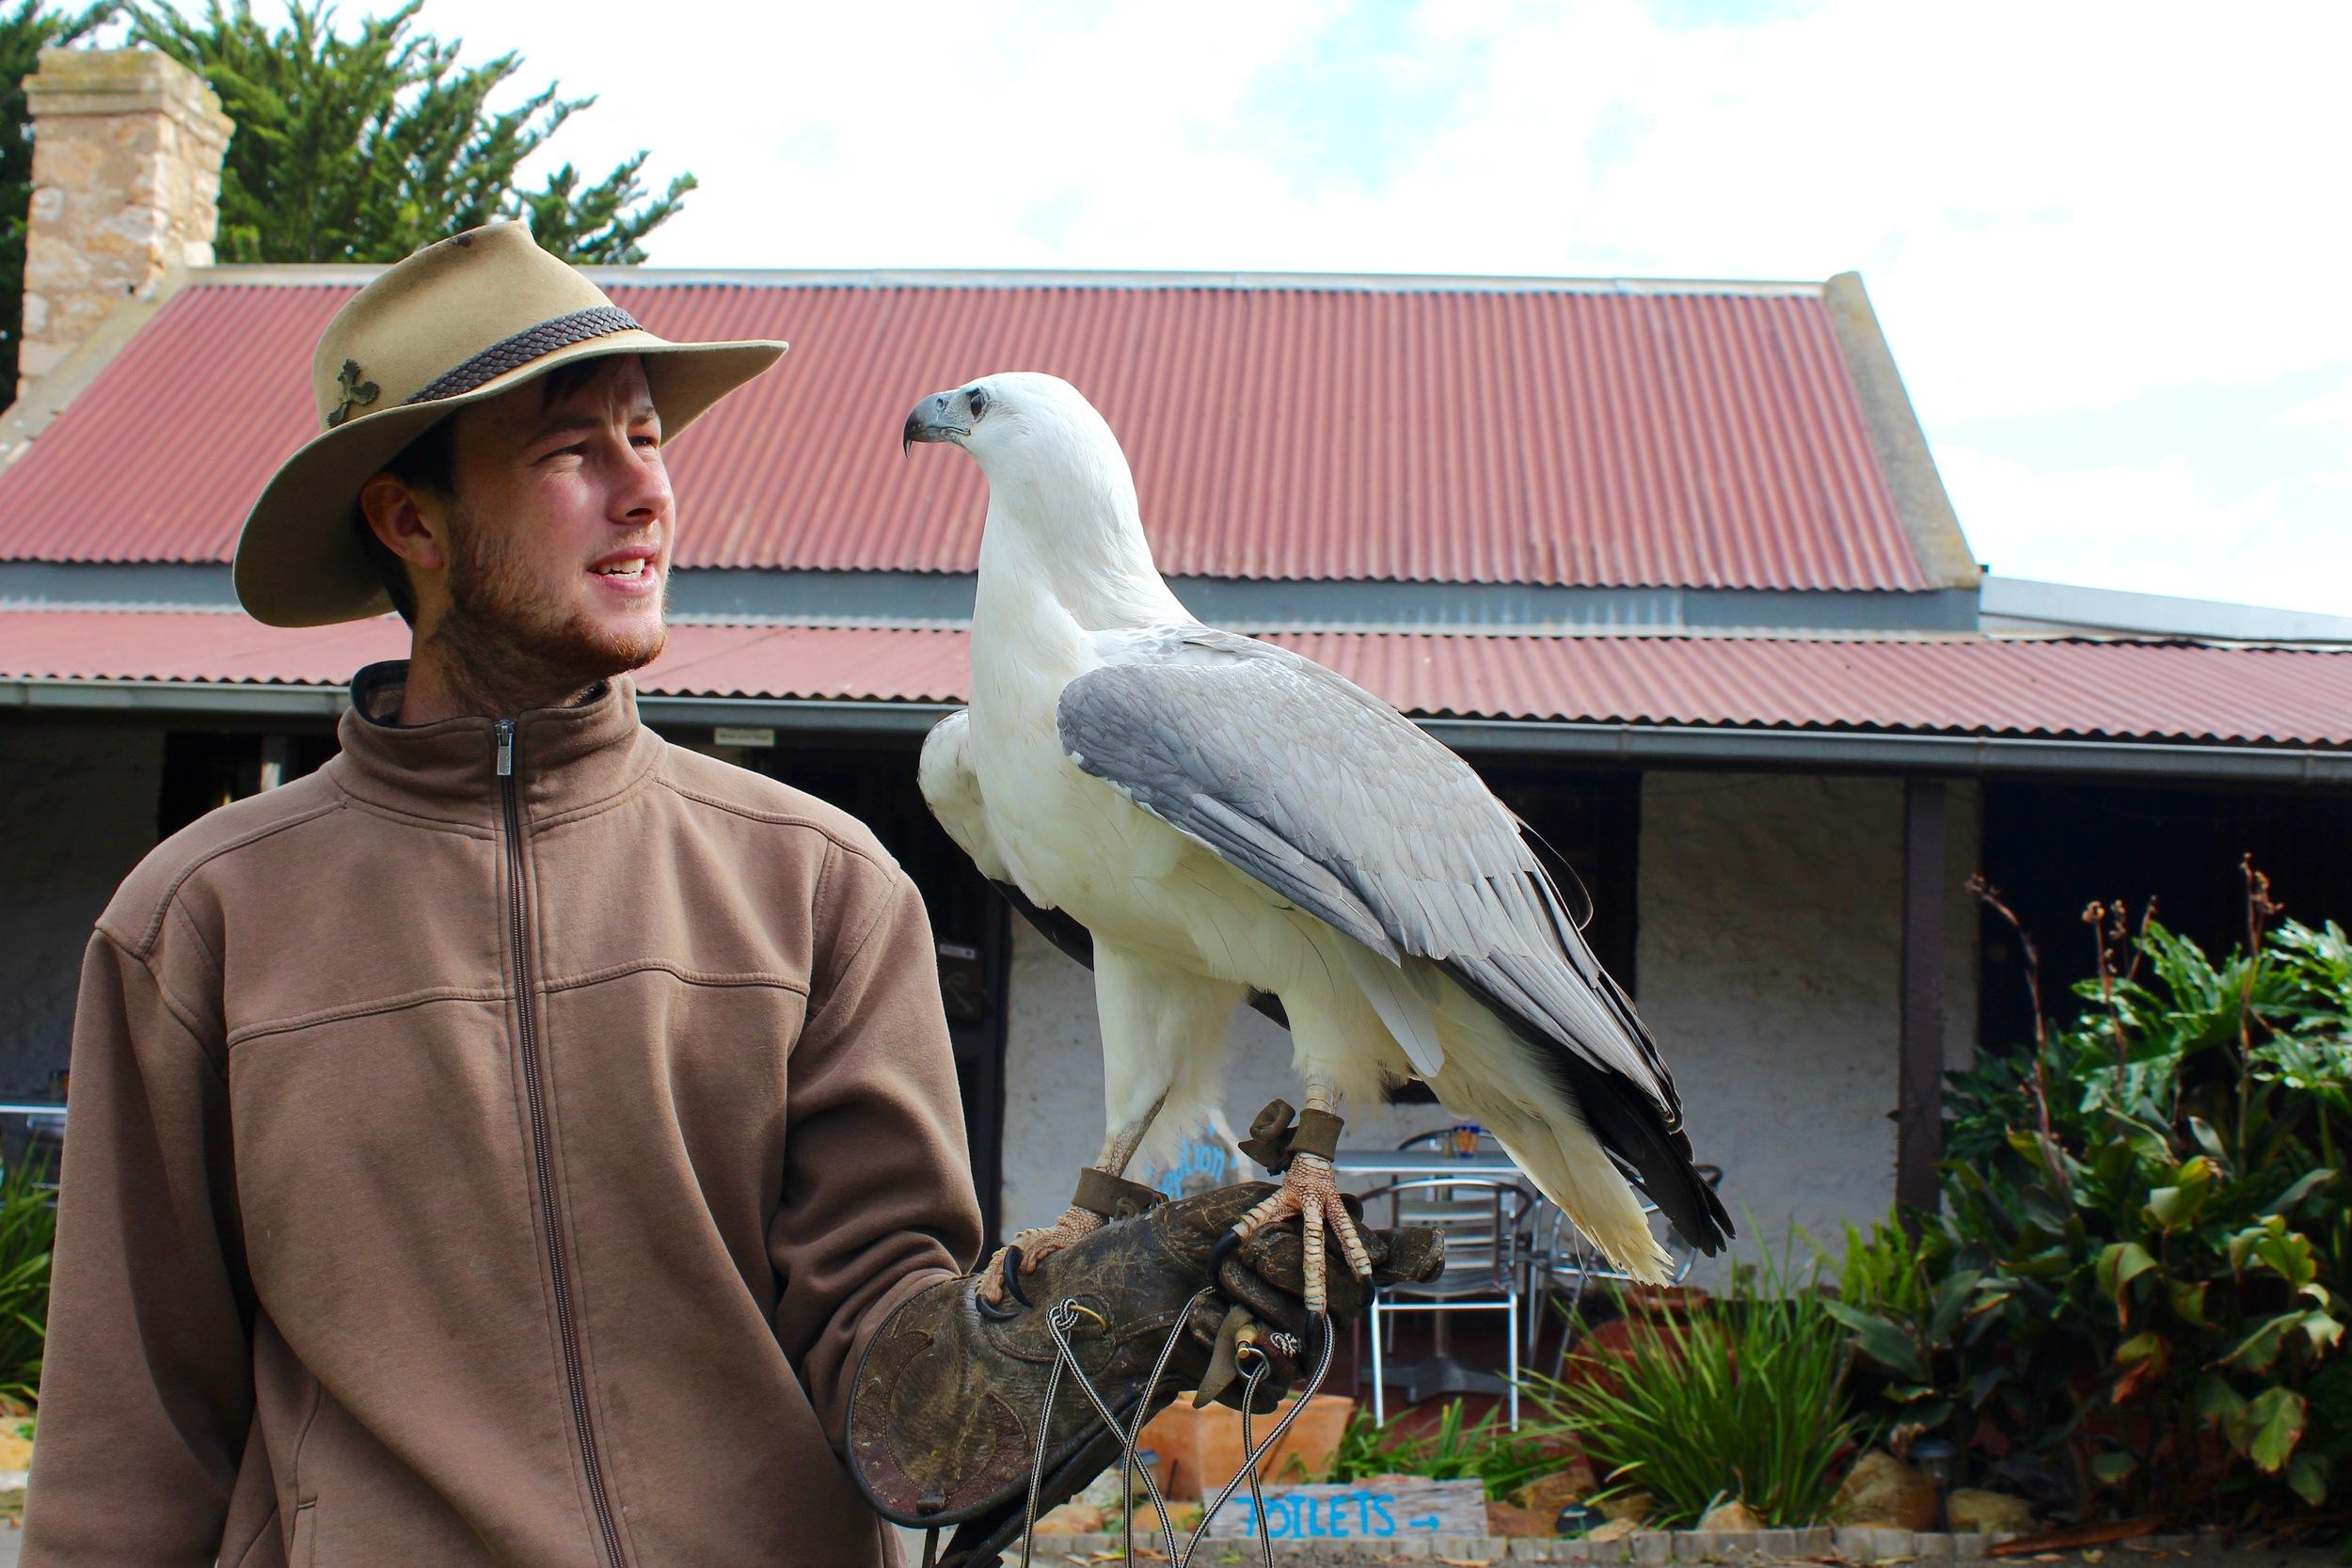 Mericai and his buddy.